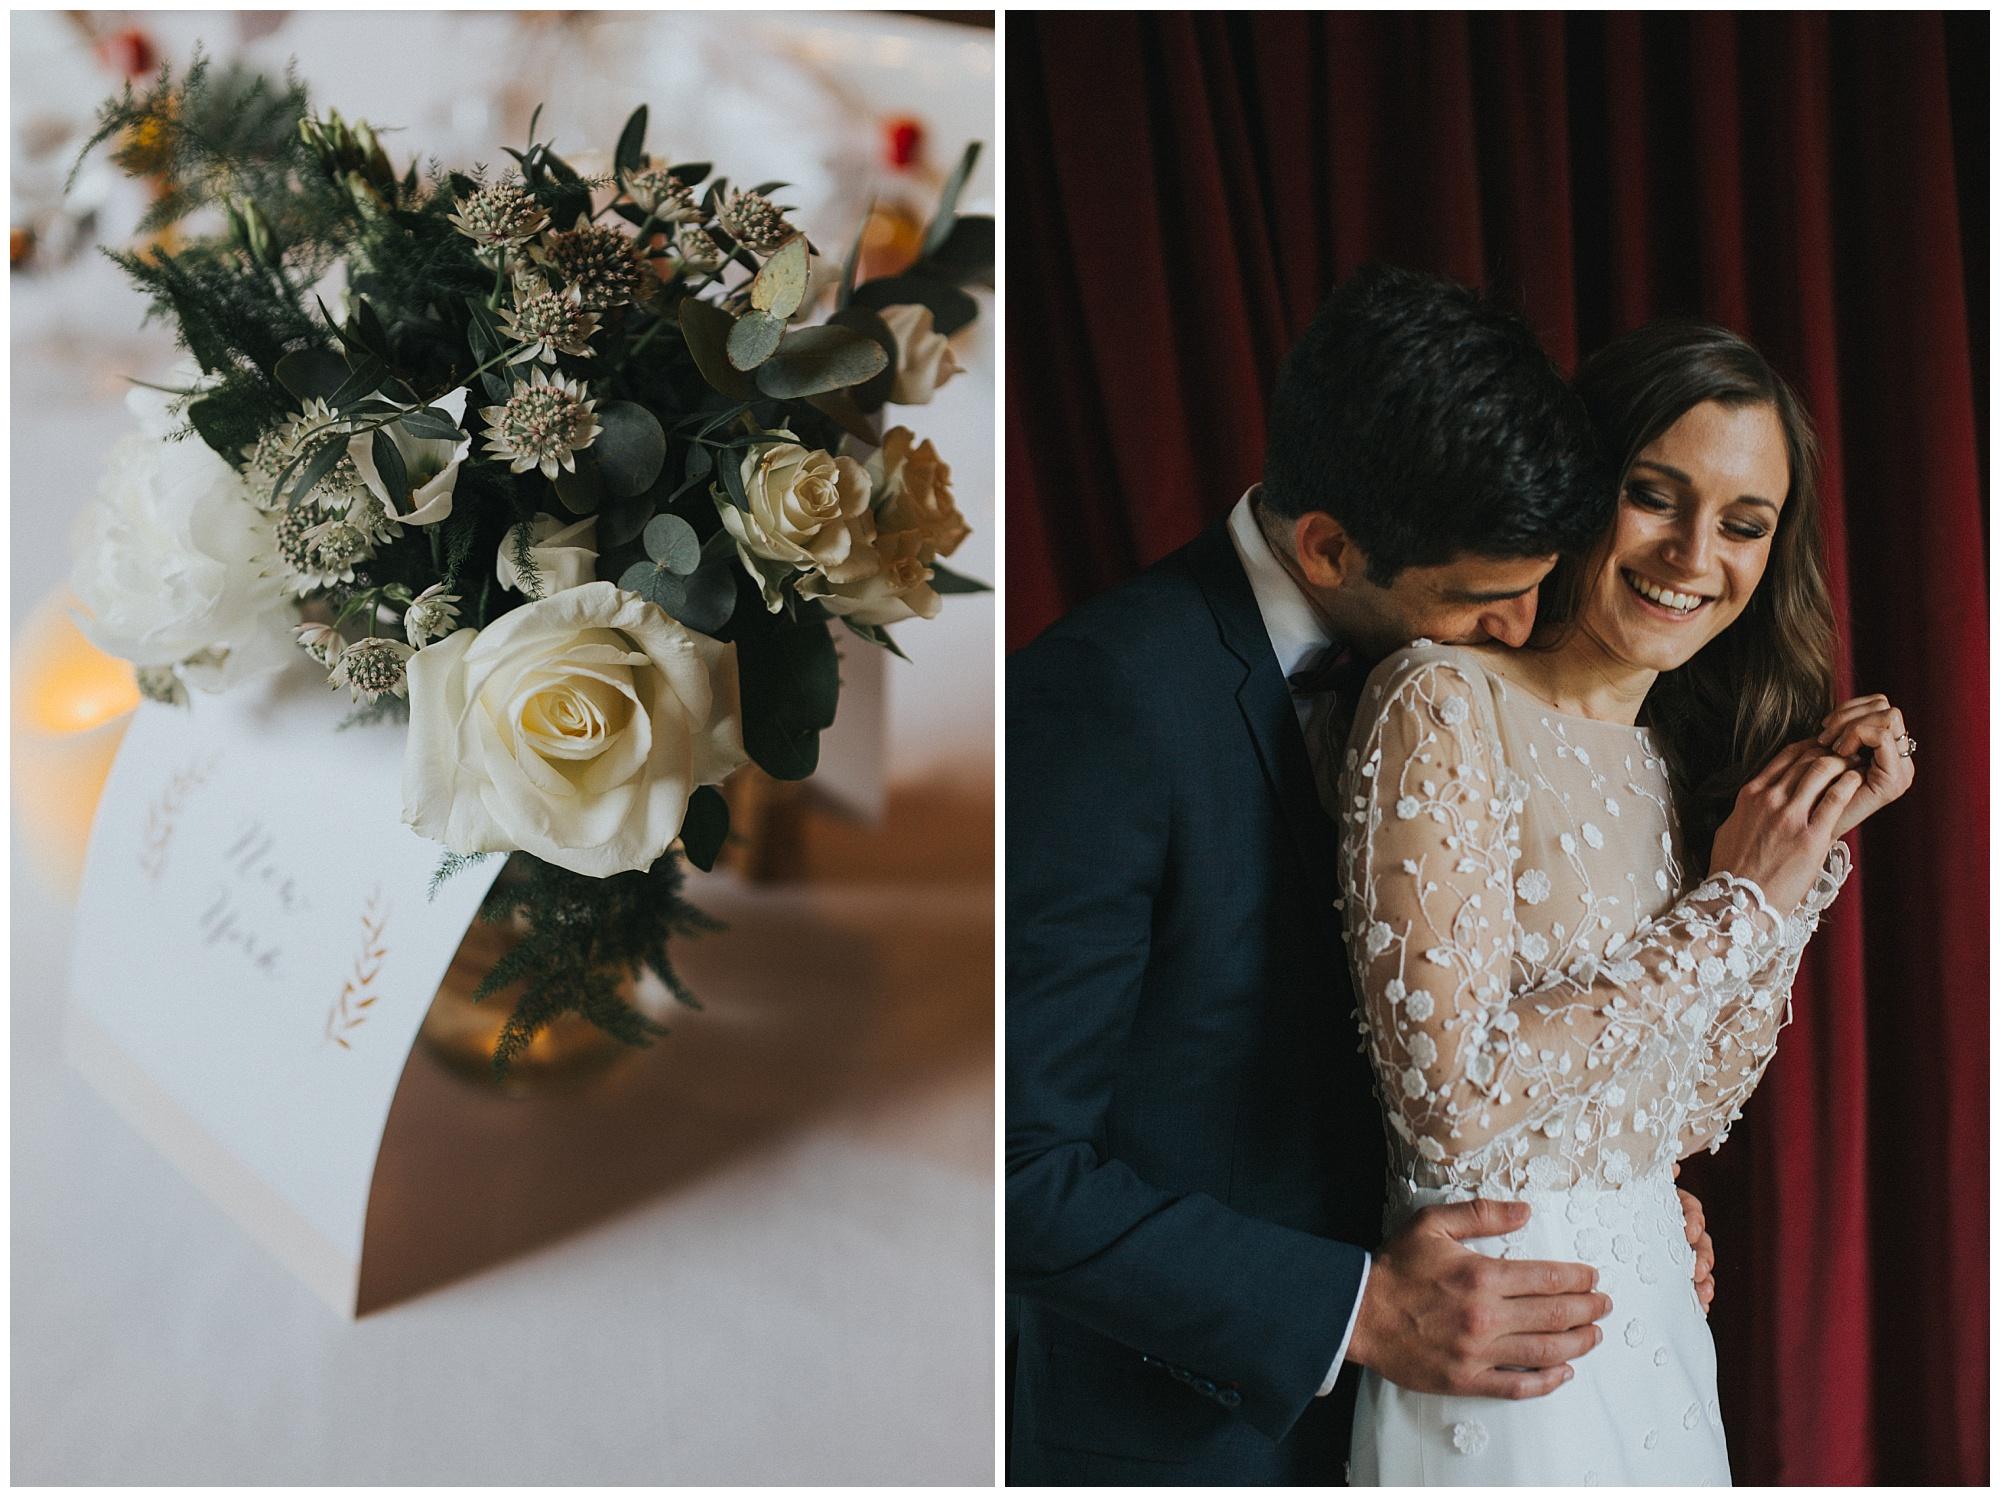 Kateryna-photos-photographer-domaine-des-evis-mariage-normandie-rime-arodaky_fleurs